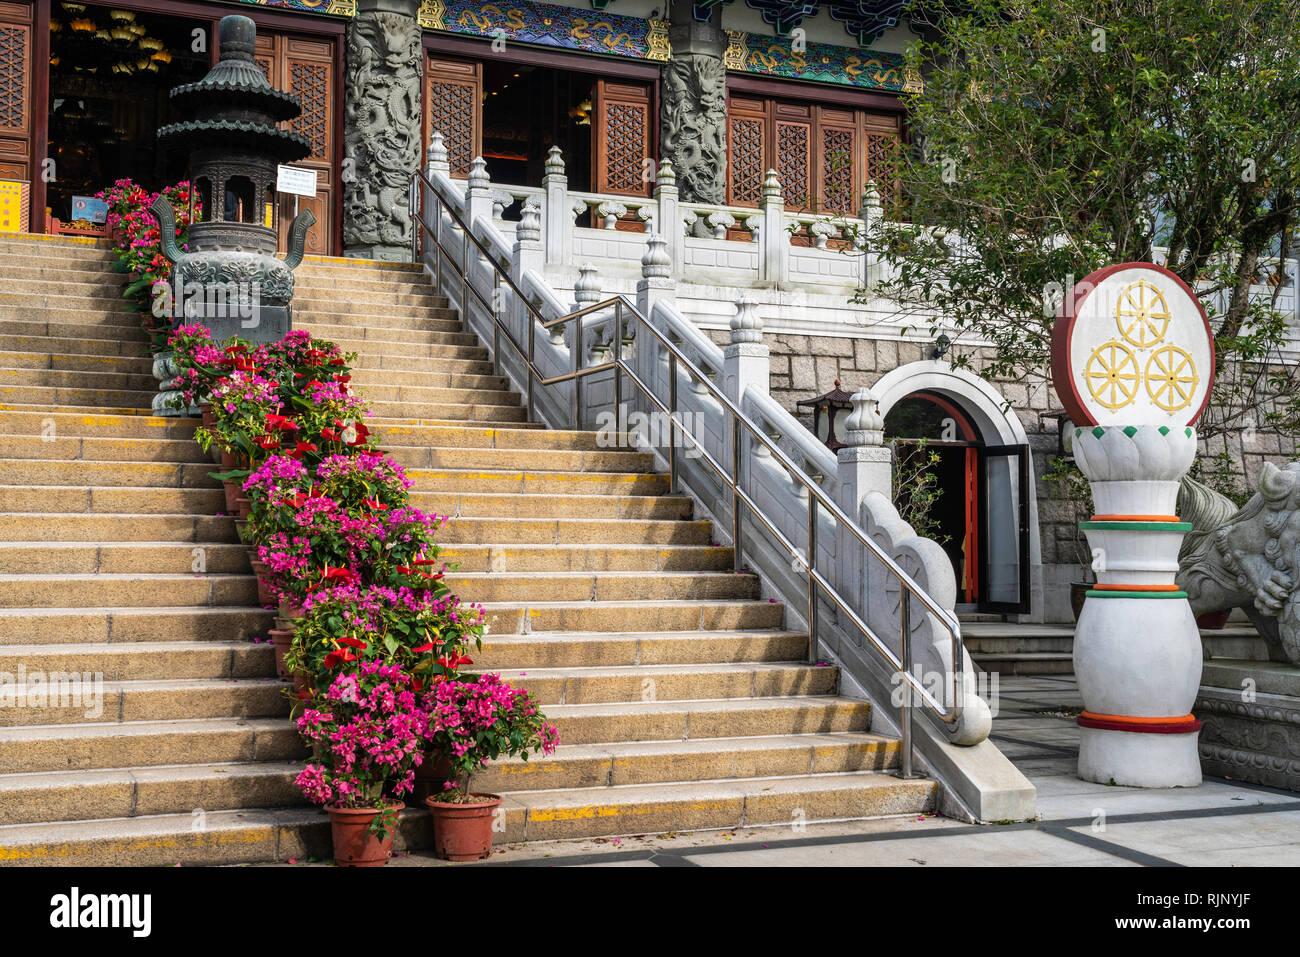 The Po Lin Monastery on Lantau Island, Hong Kong, China, Asia. - Stock Image